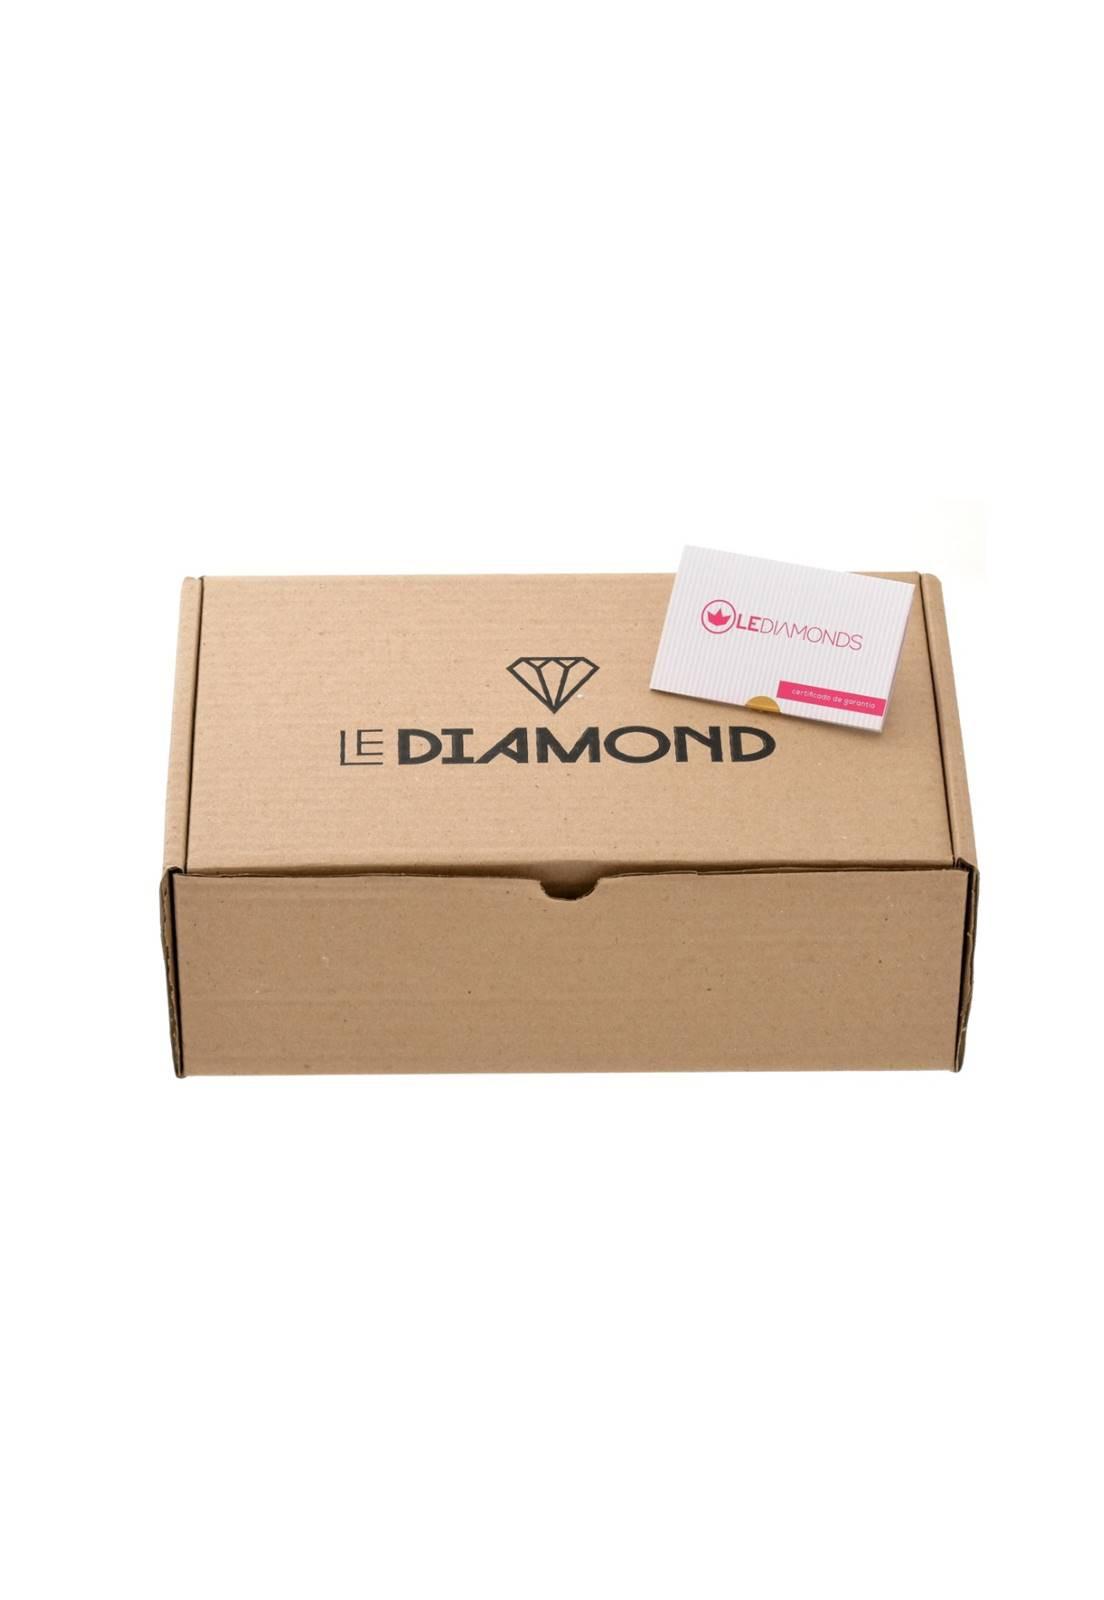 Brinco Le Diamond Base Triângulo Acrílico com Chapa